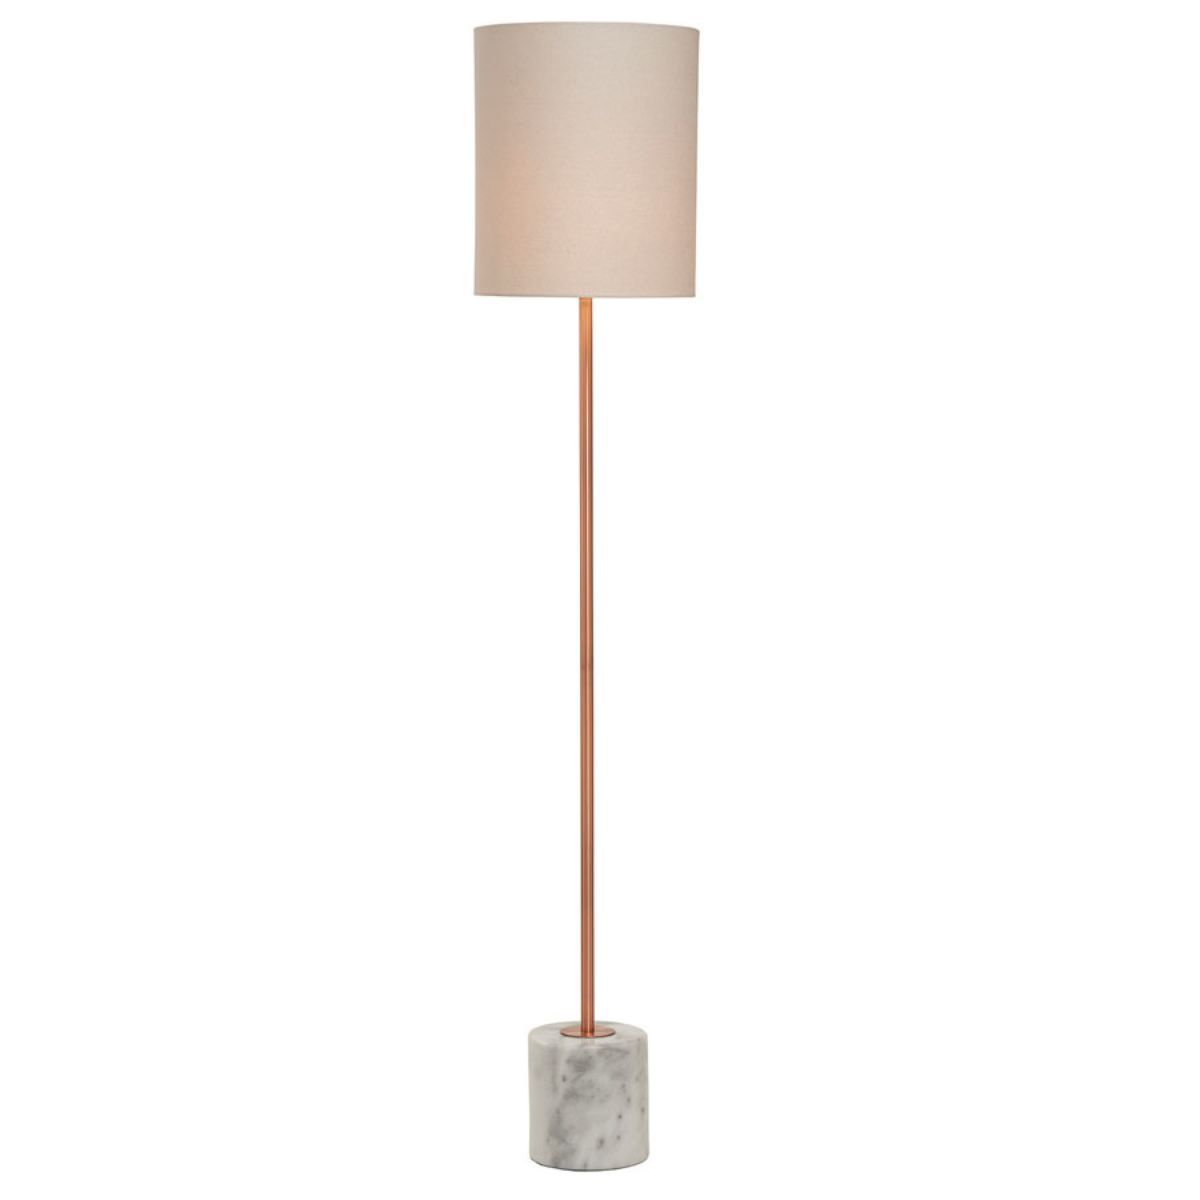 Village At Home Bianco Floor Lamp - Copper